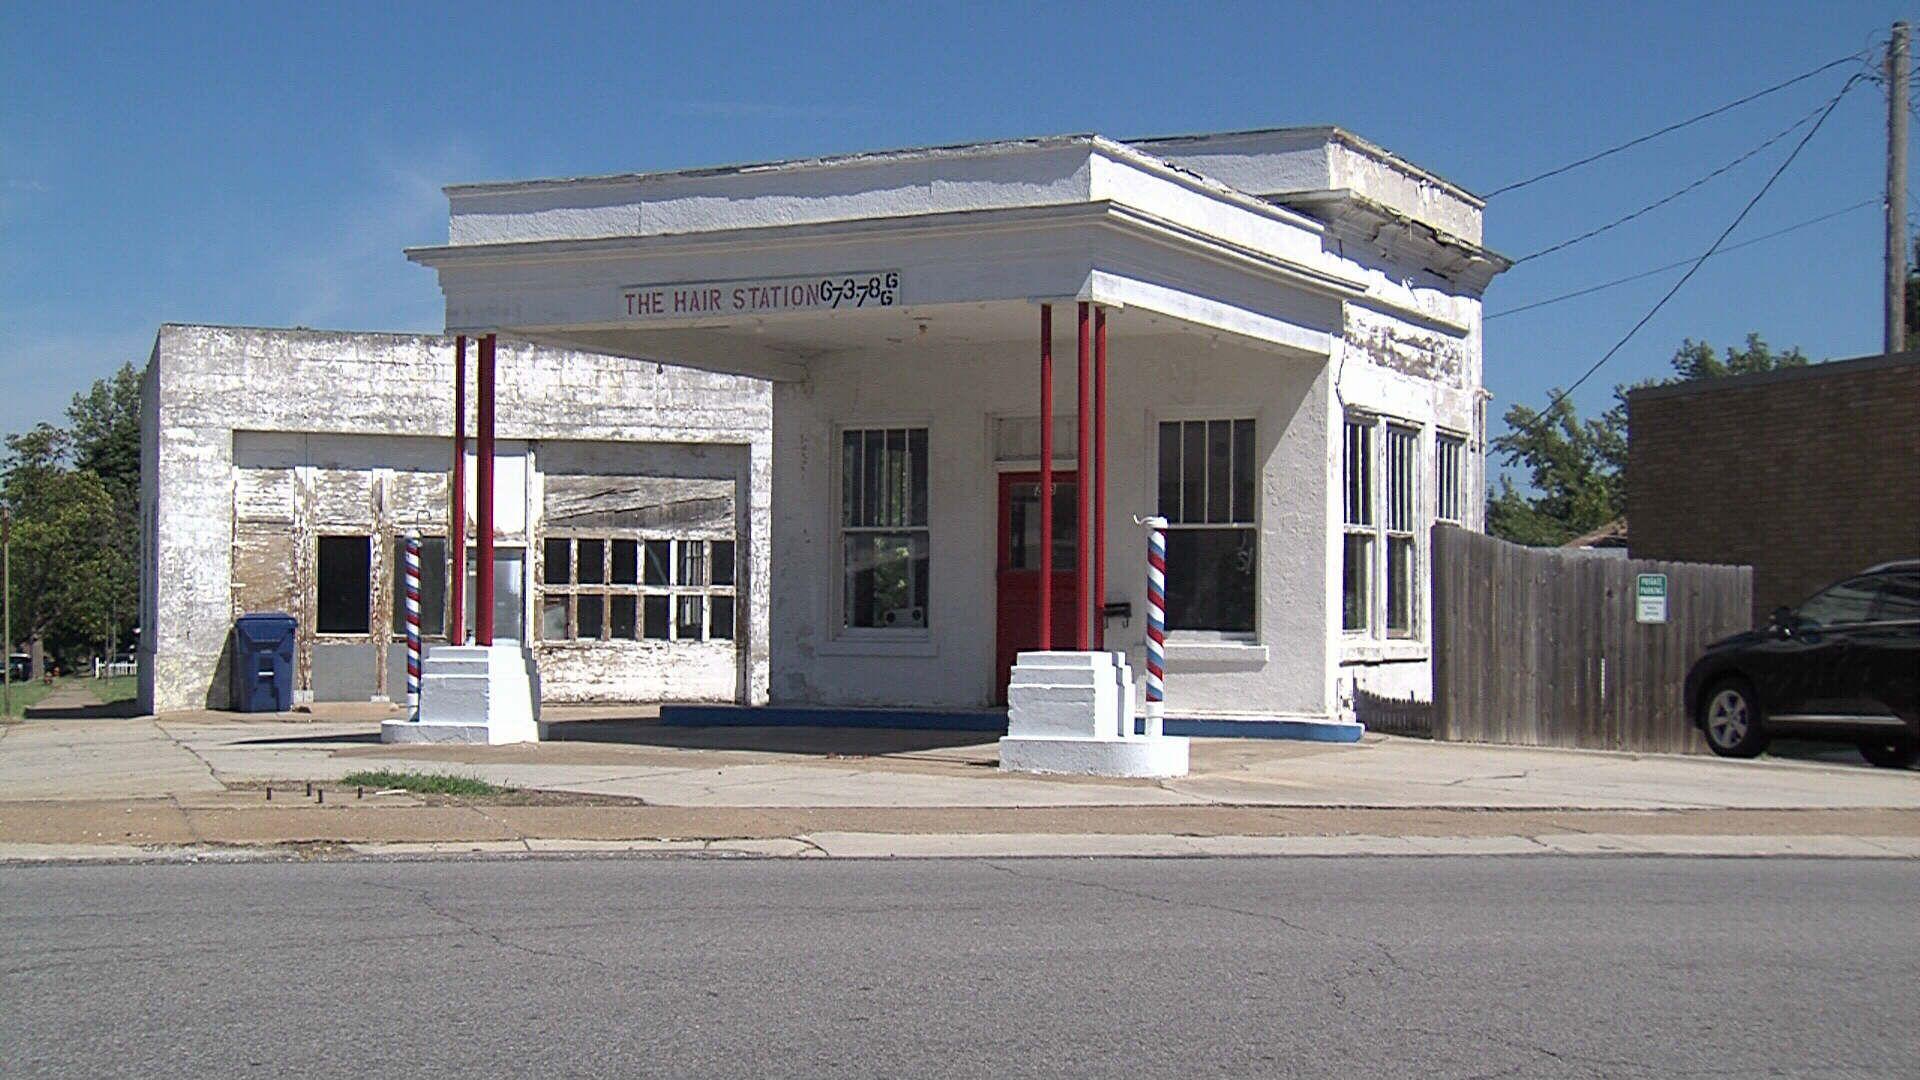 Gas Station and Garage, Webb City, Missouri   Route 66 Missouri ...